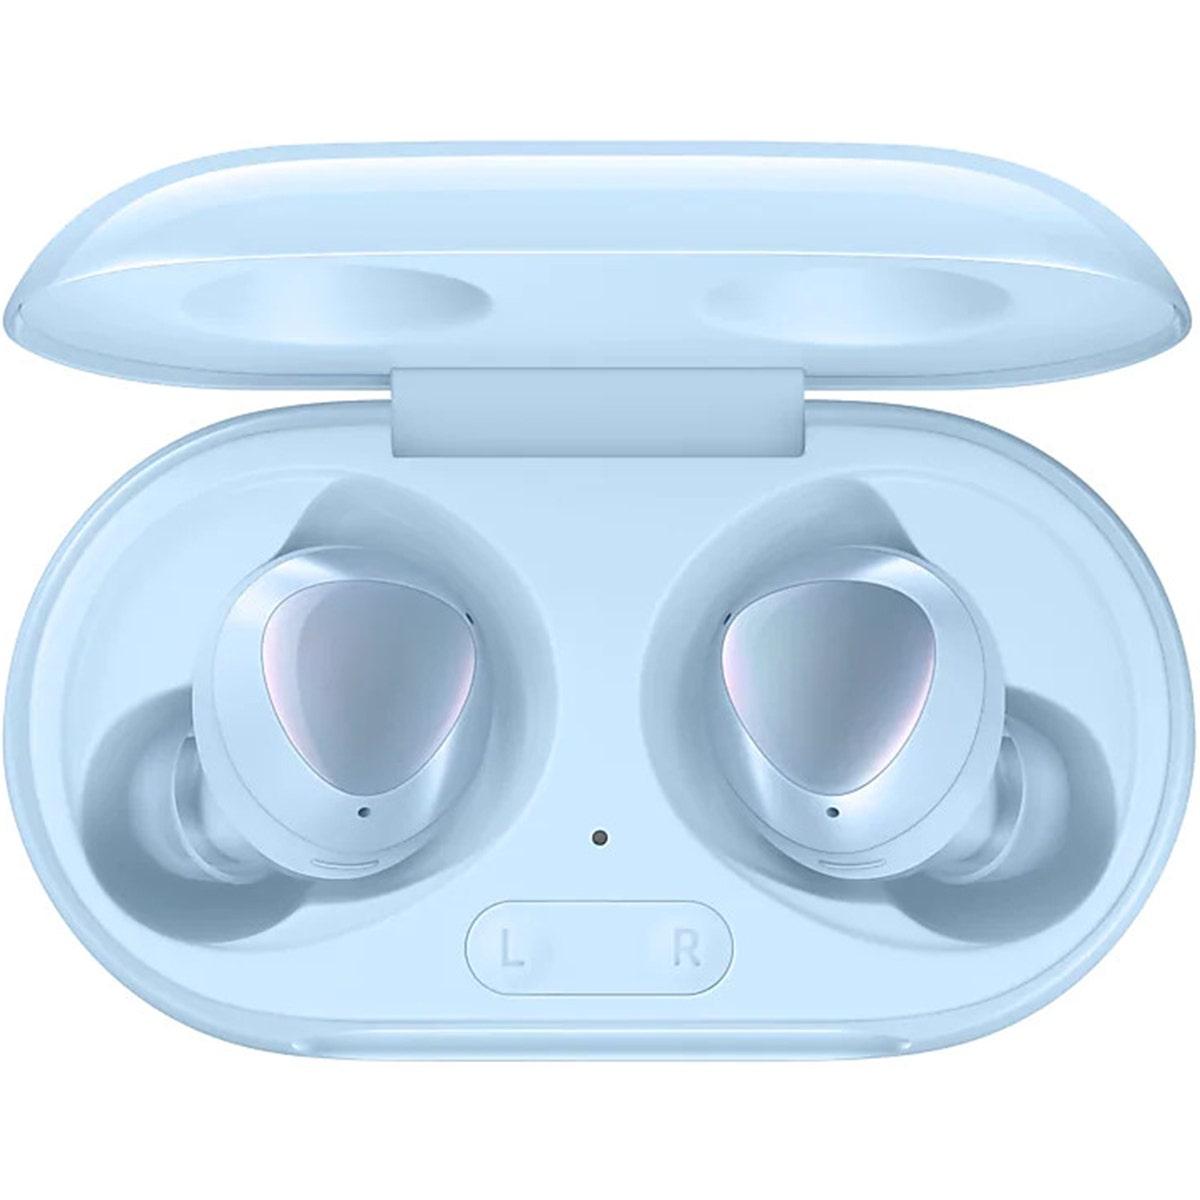 Audífonos inalámbricos Samsung Galaxy Buds+ Plus Regalía